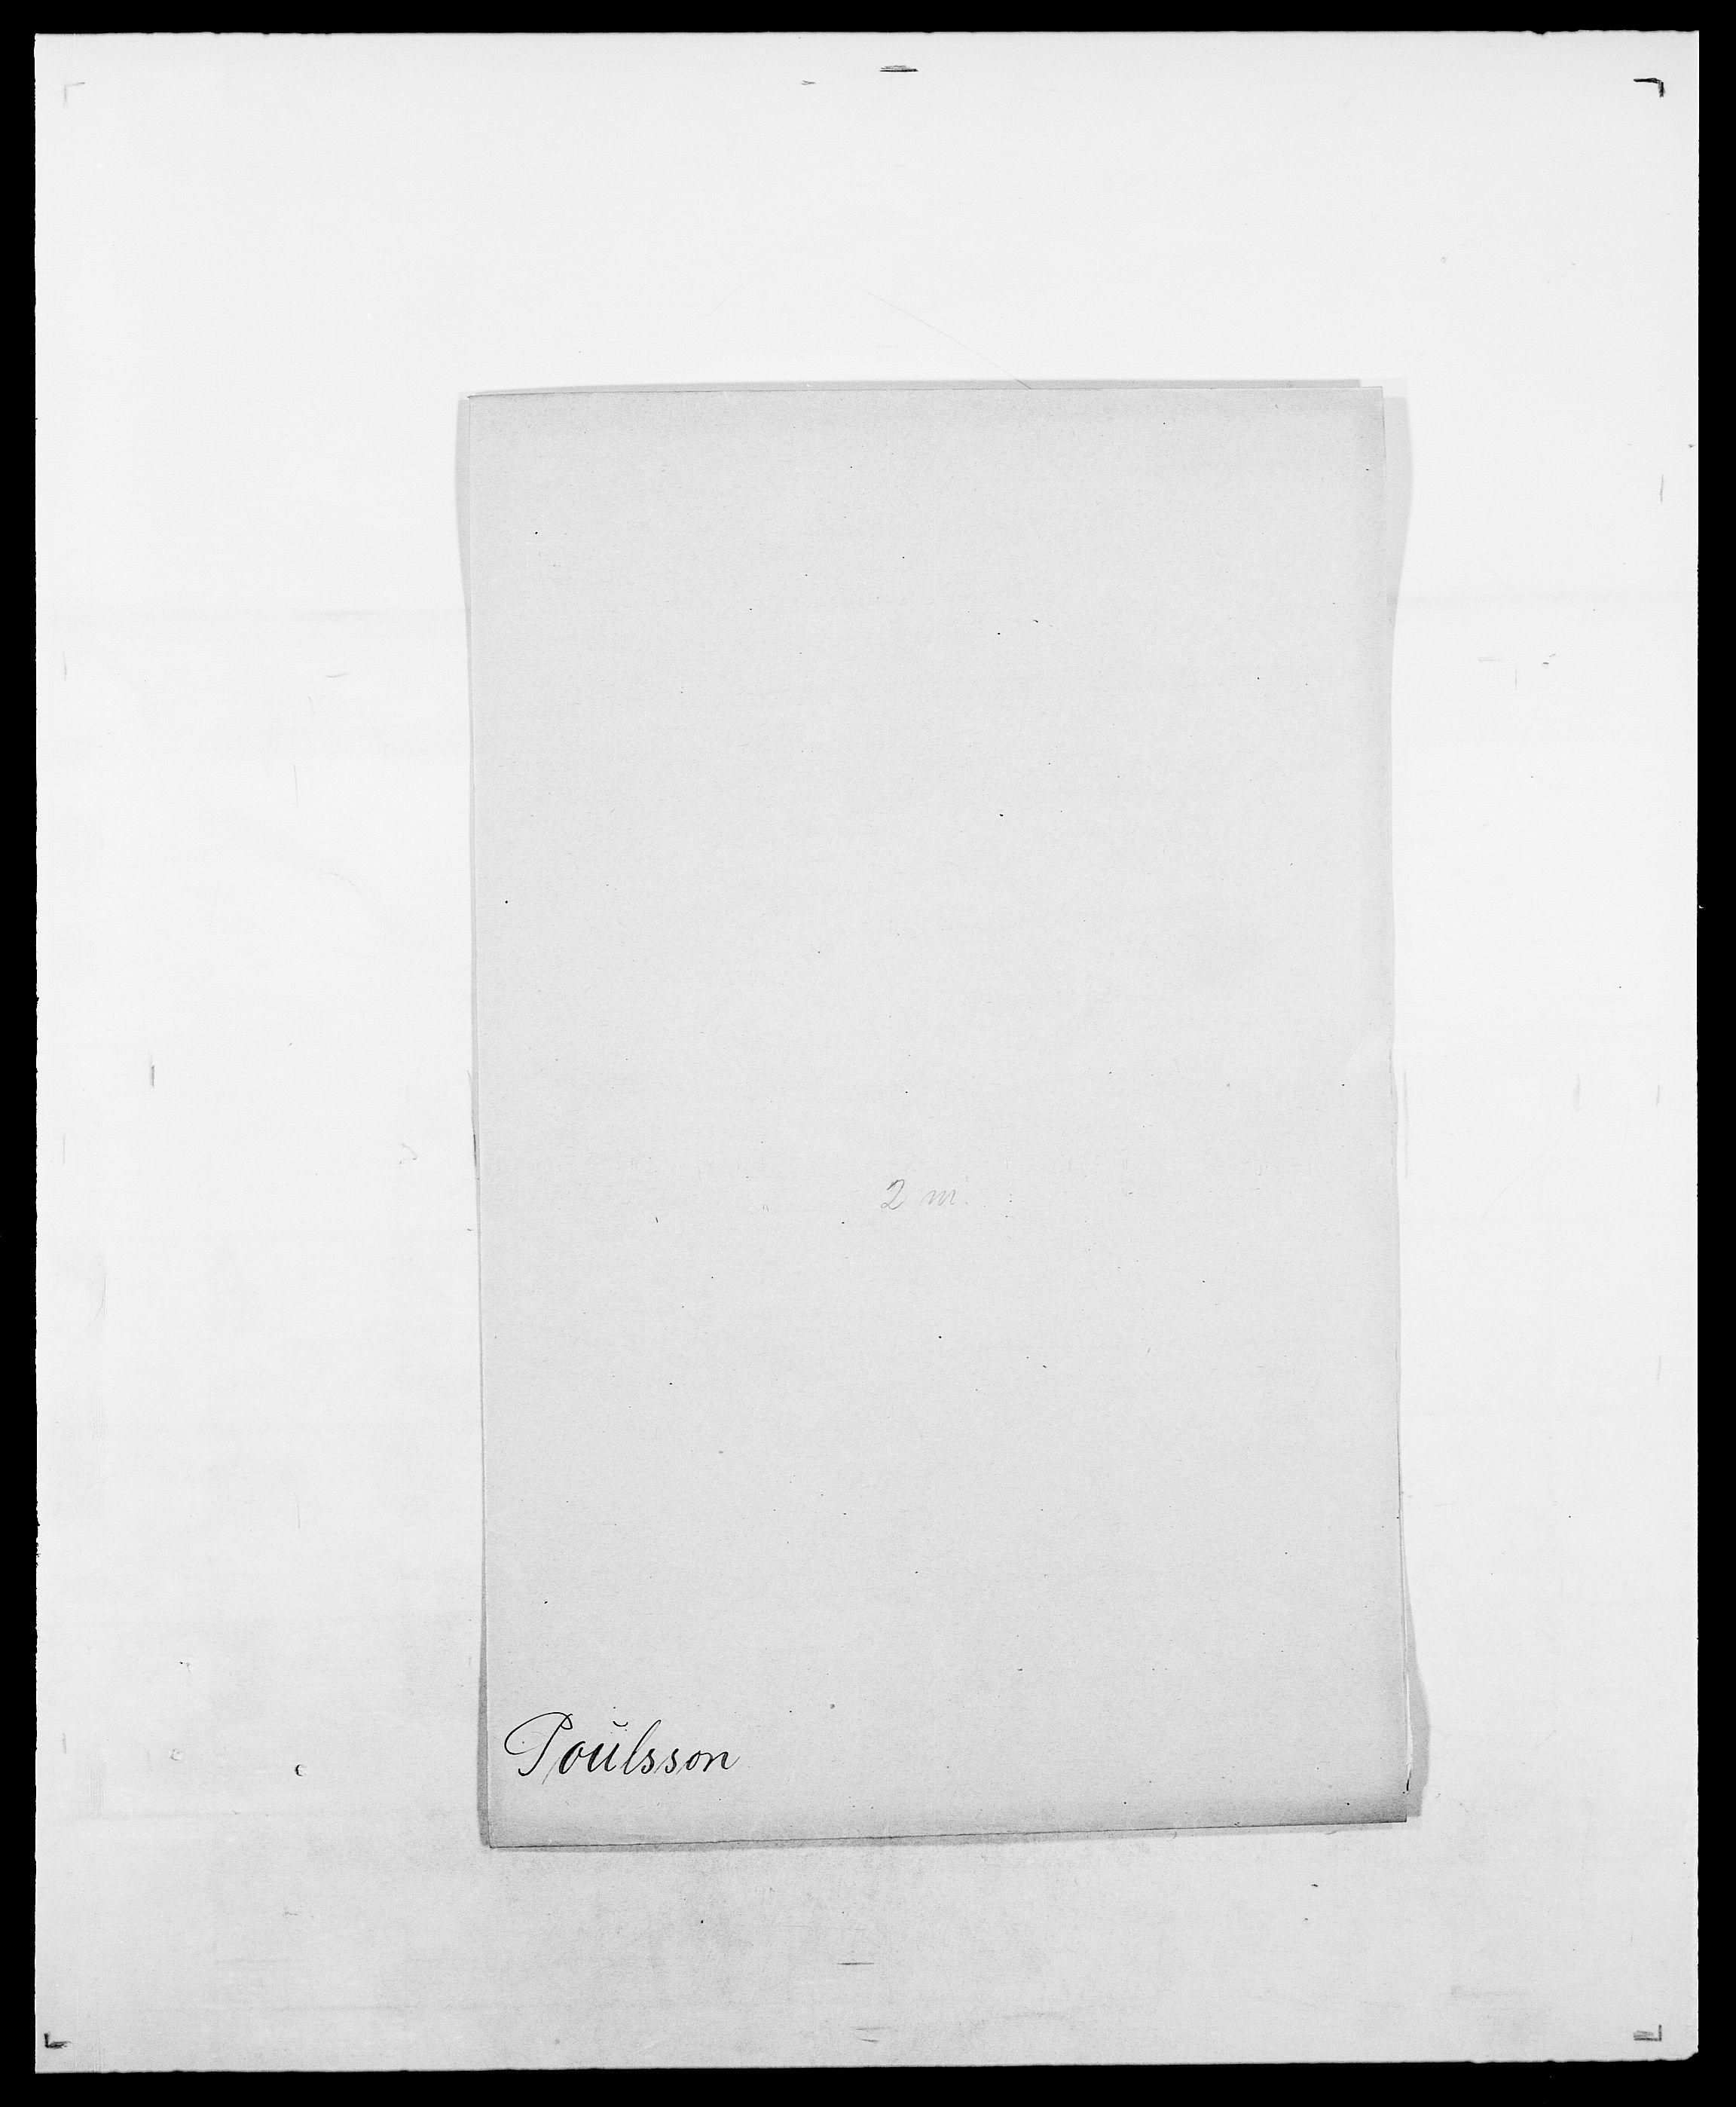 SAO, Delgobe, Charles Antoine - samling, D/Da/L0031: de Place - Raaum, s. 268